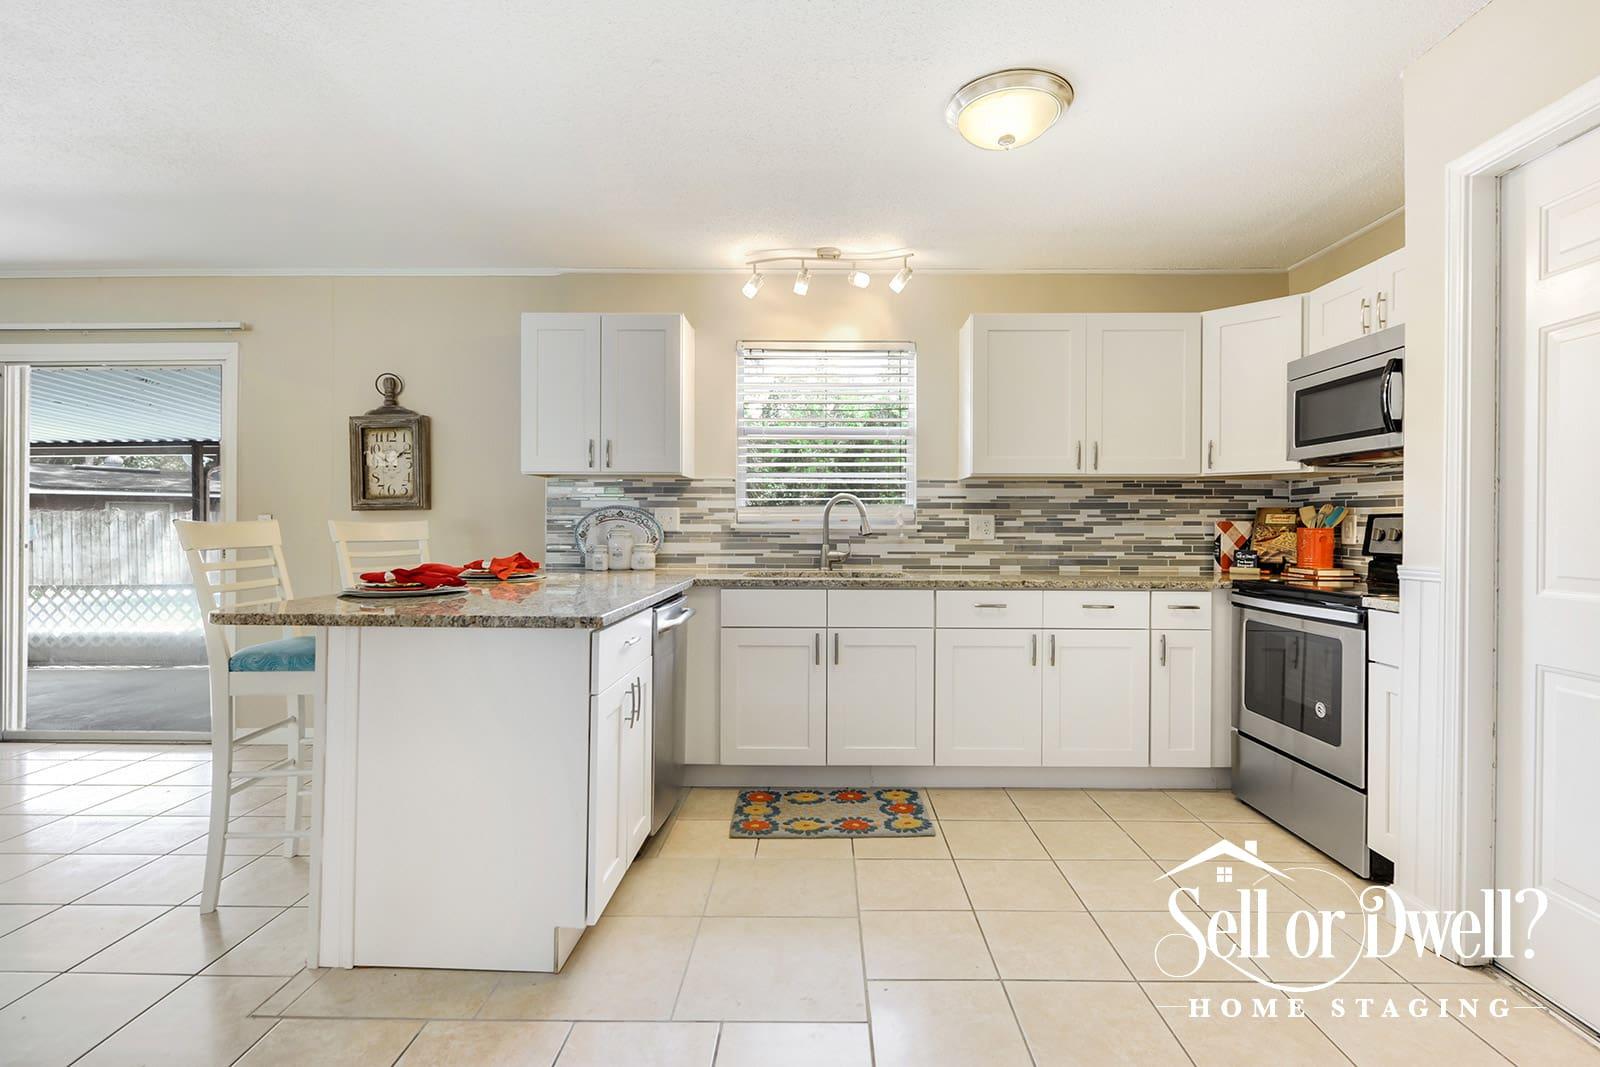 Best-home-selling-tips.jpg